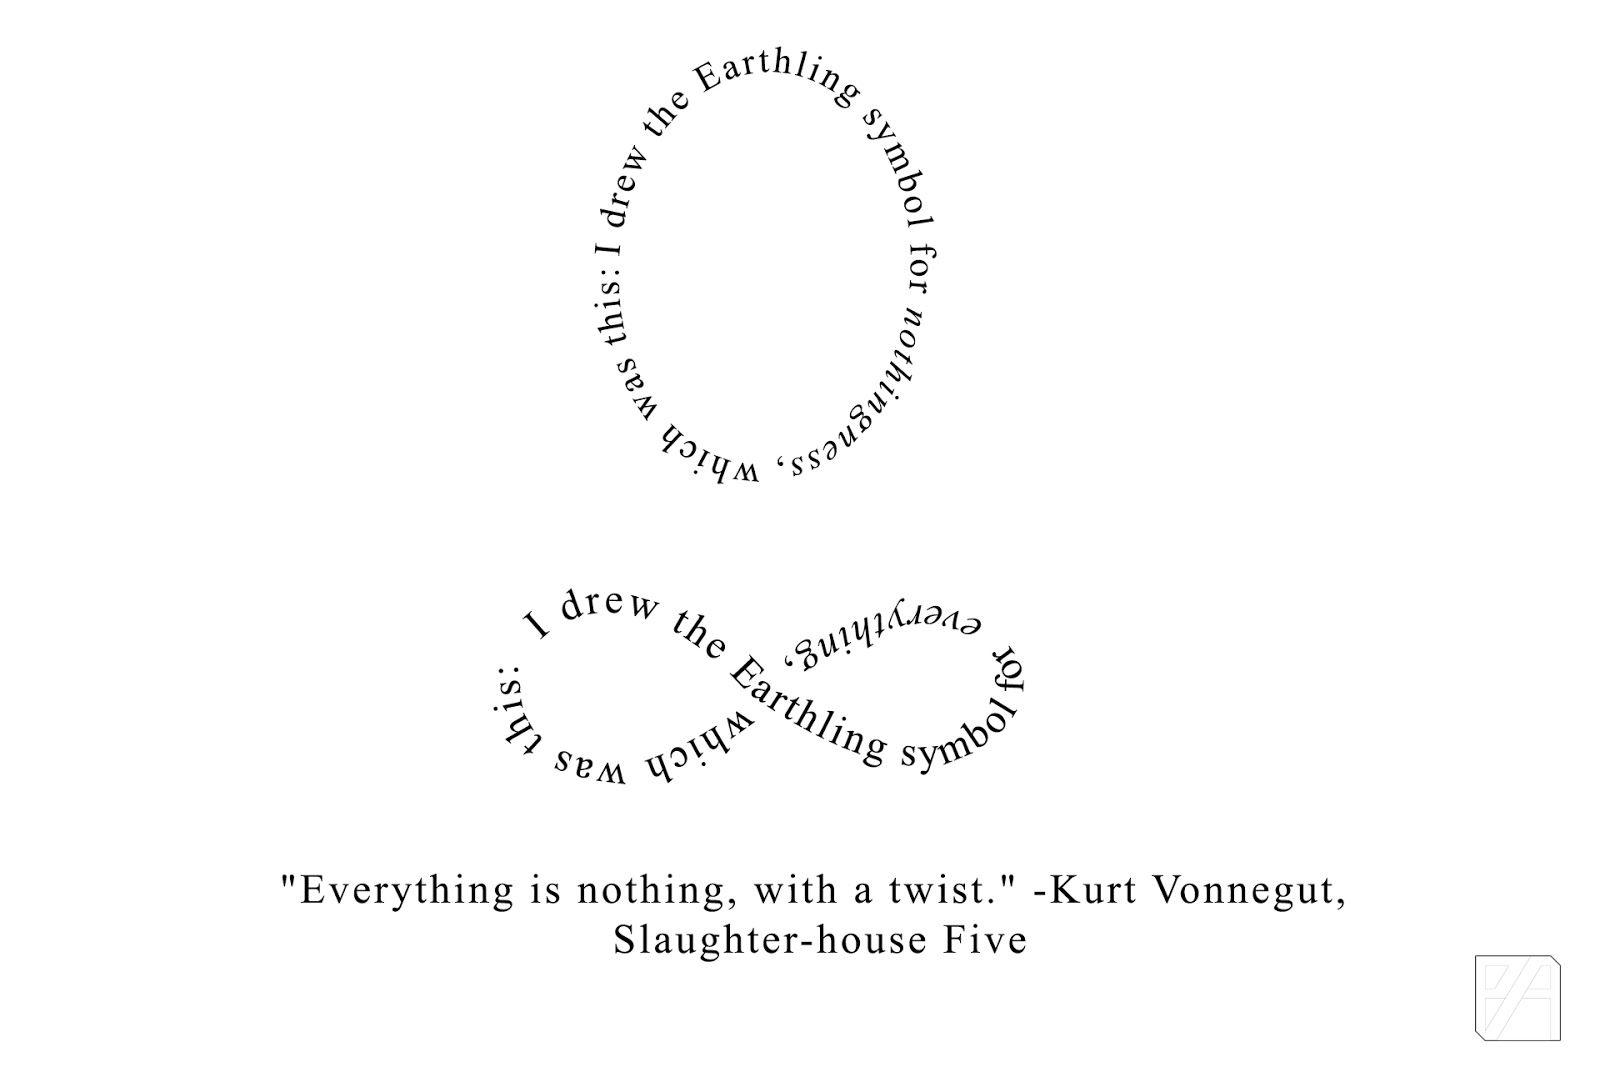 symbols in slaughterhouse five